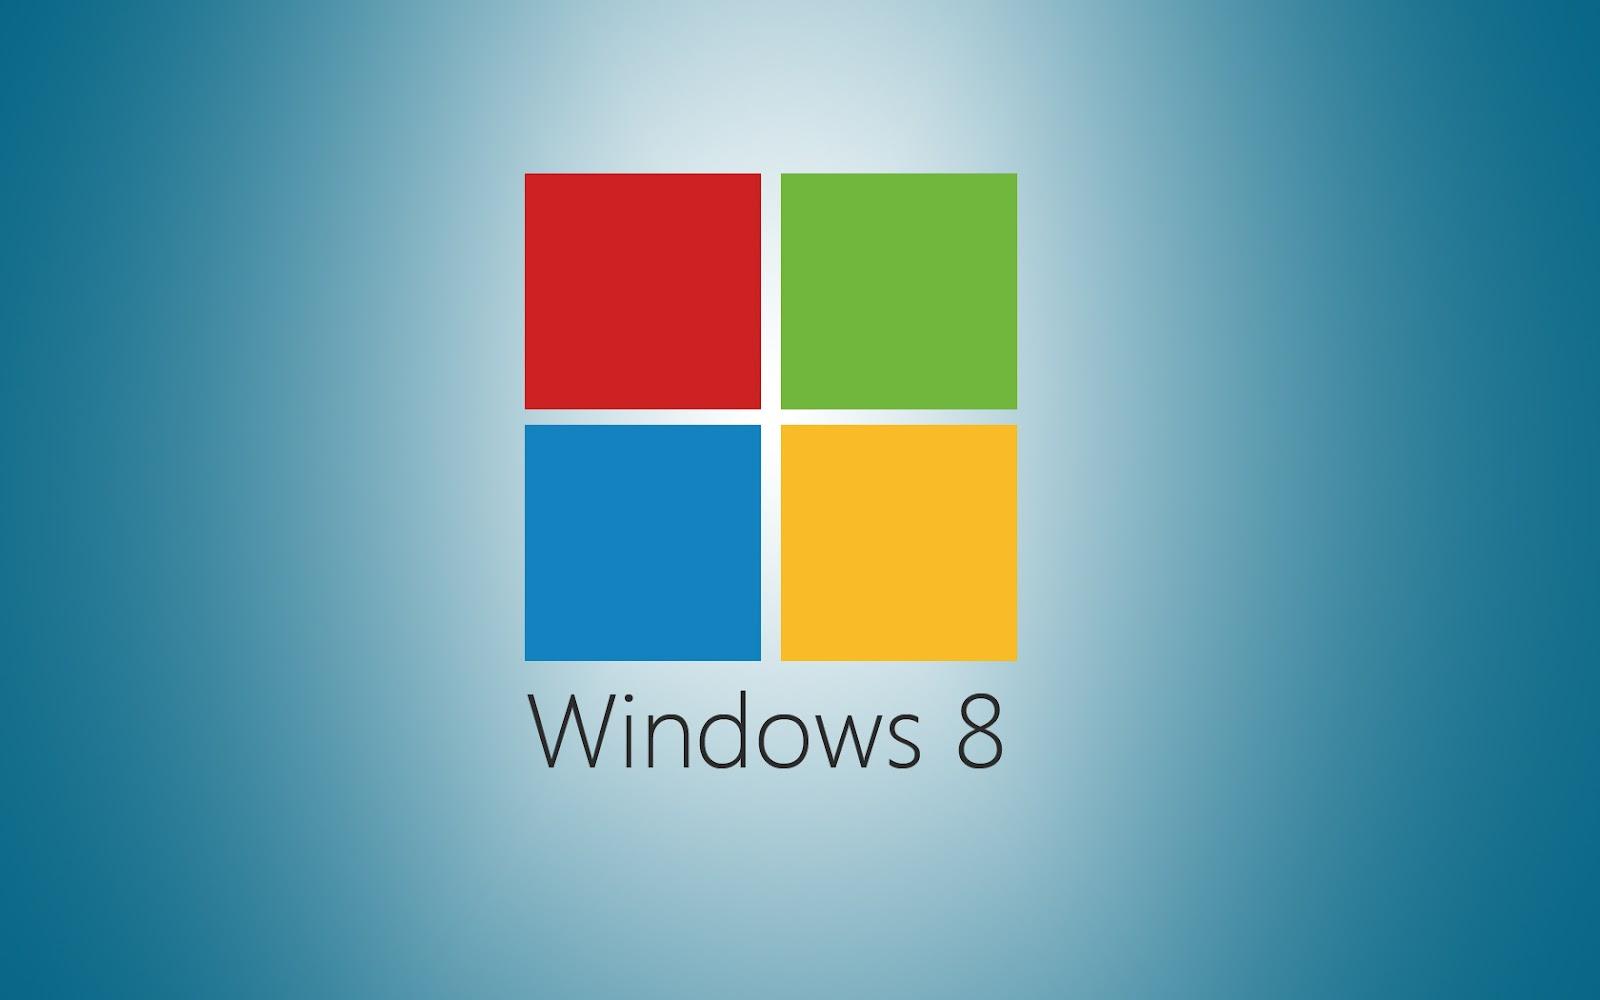 http://3.bp.blogspot.com/-Qz3Fv7Bi9Hg/T6AQamiM1VI/AAAAAAAAASE/1qqZ-GSYSR8/s1600/windows_8_wallpaper_by_windows_8_user-d4olhmj.jpg